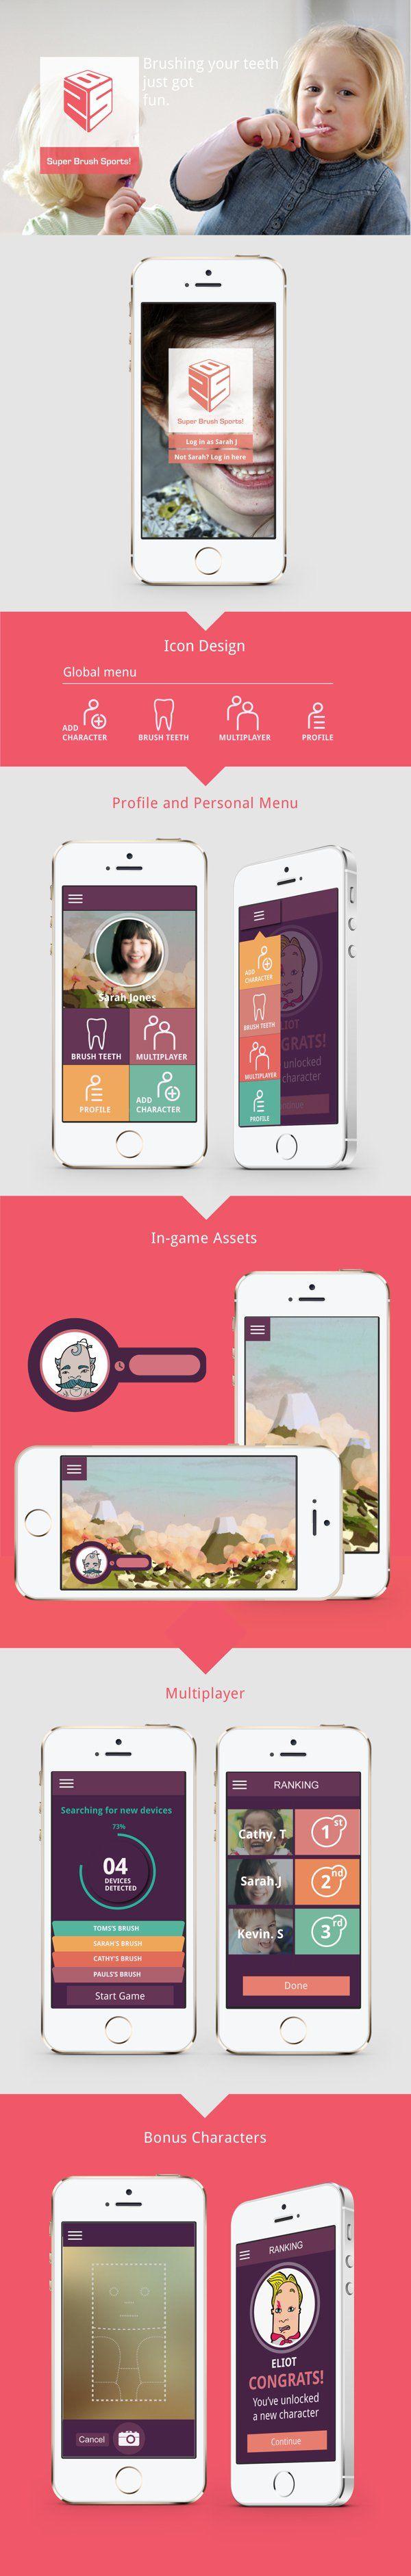 zakicc采集到App.phone - 花瓣